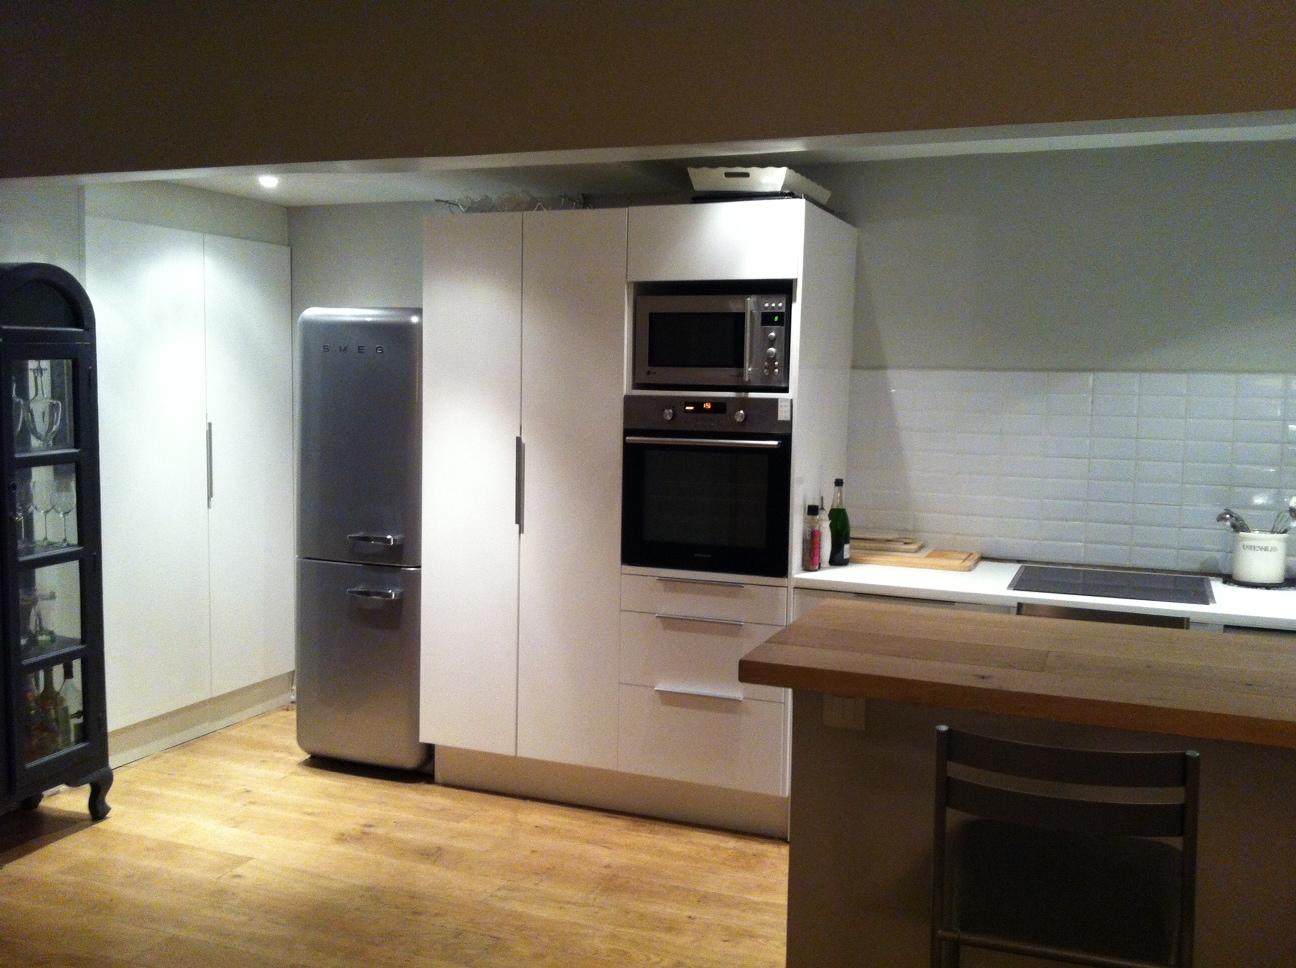 Installateur cuisine ikea boulogne billancourt 92 - Ikea meubles de jardin boulogne billancourt ...